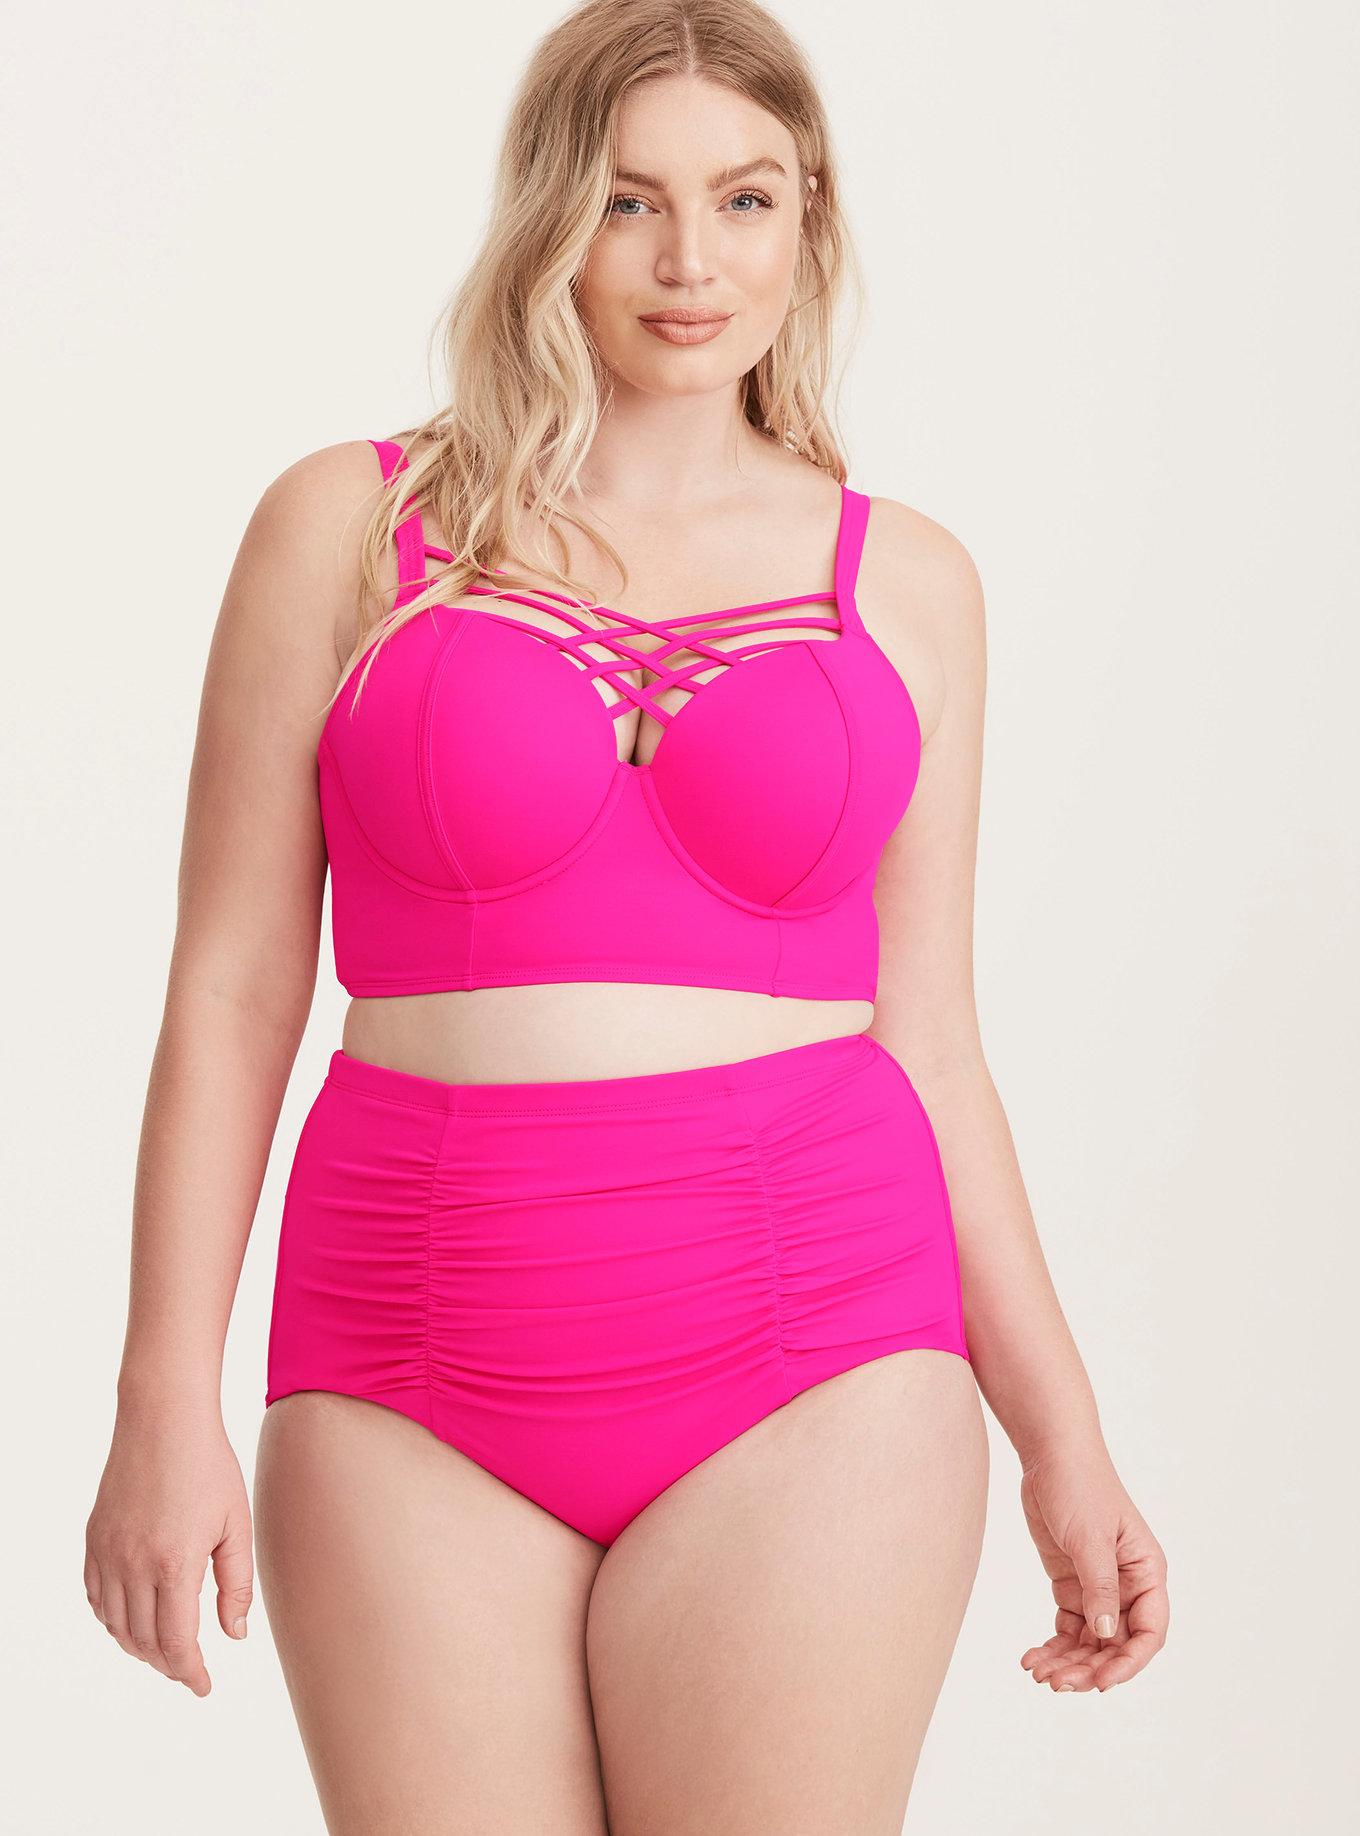 50 Plus Size Swimsuits under $100